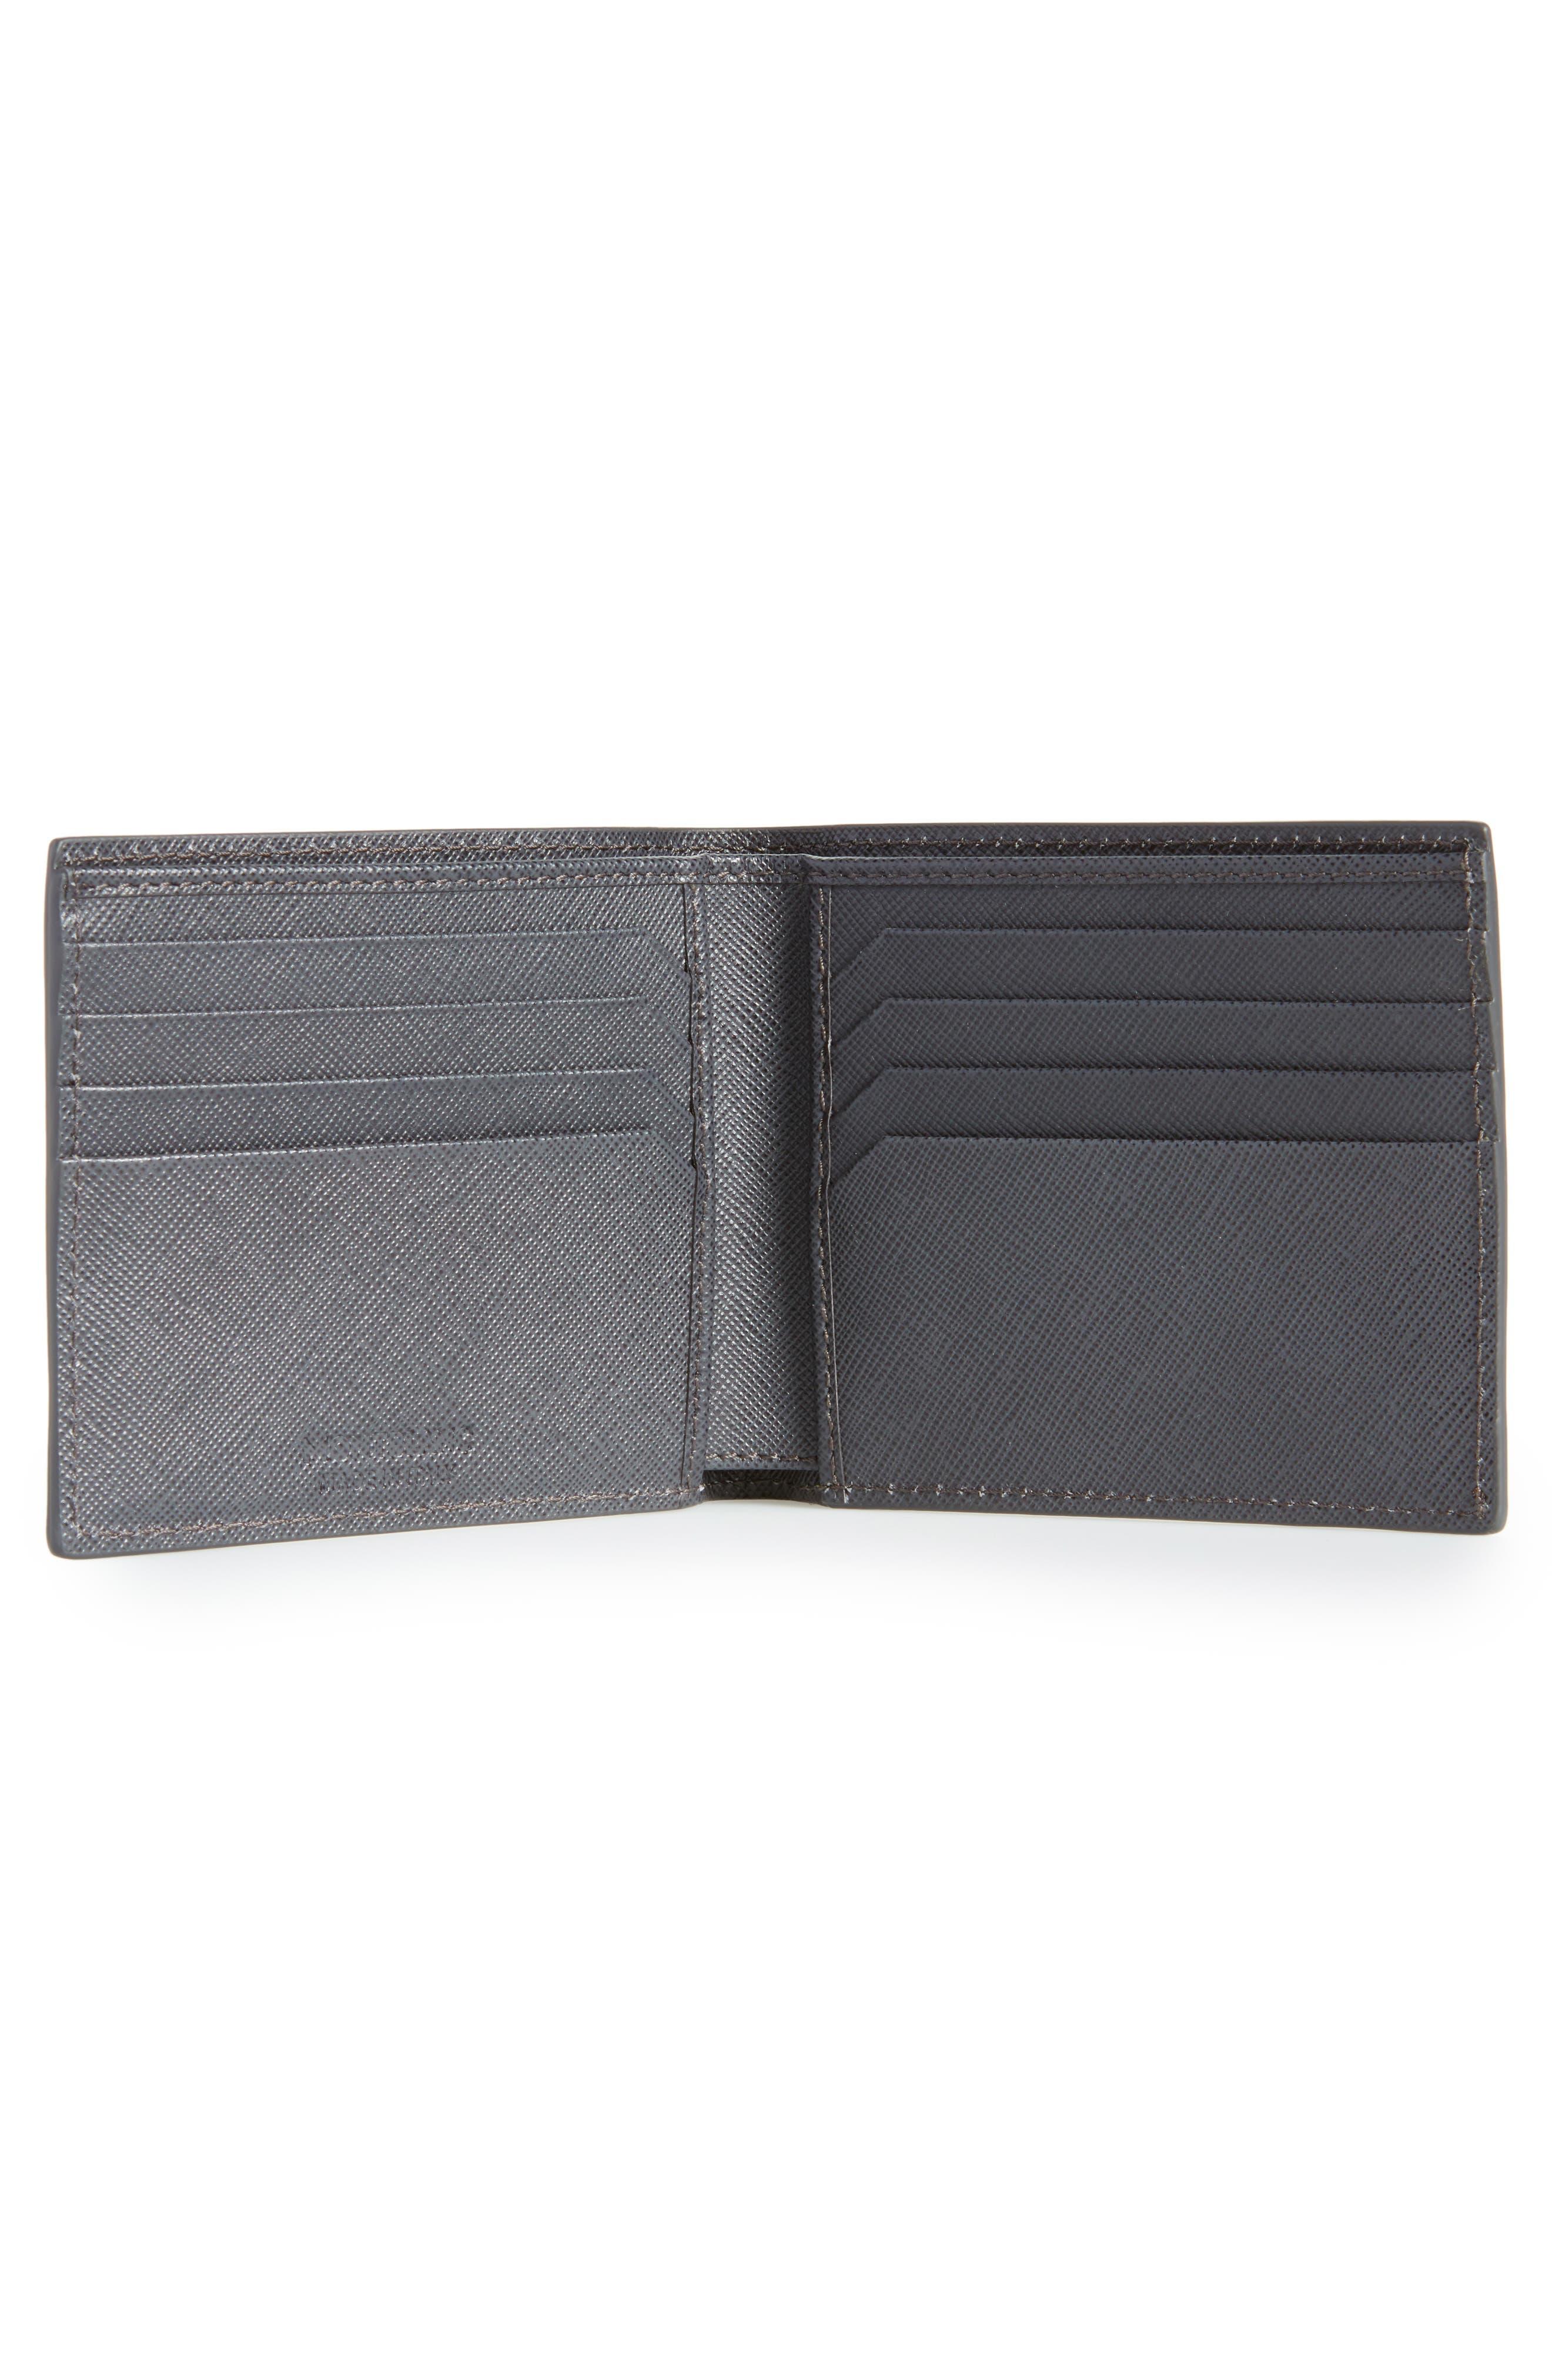 Sartorial Leather Bifold Wallet,                             Alternate thumbnail 2, color,                             DARK GREY